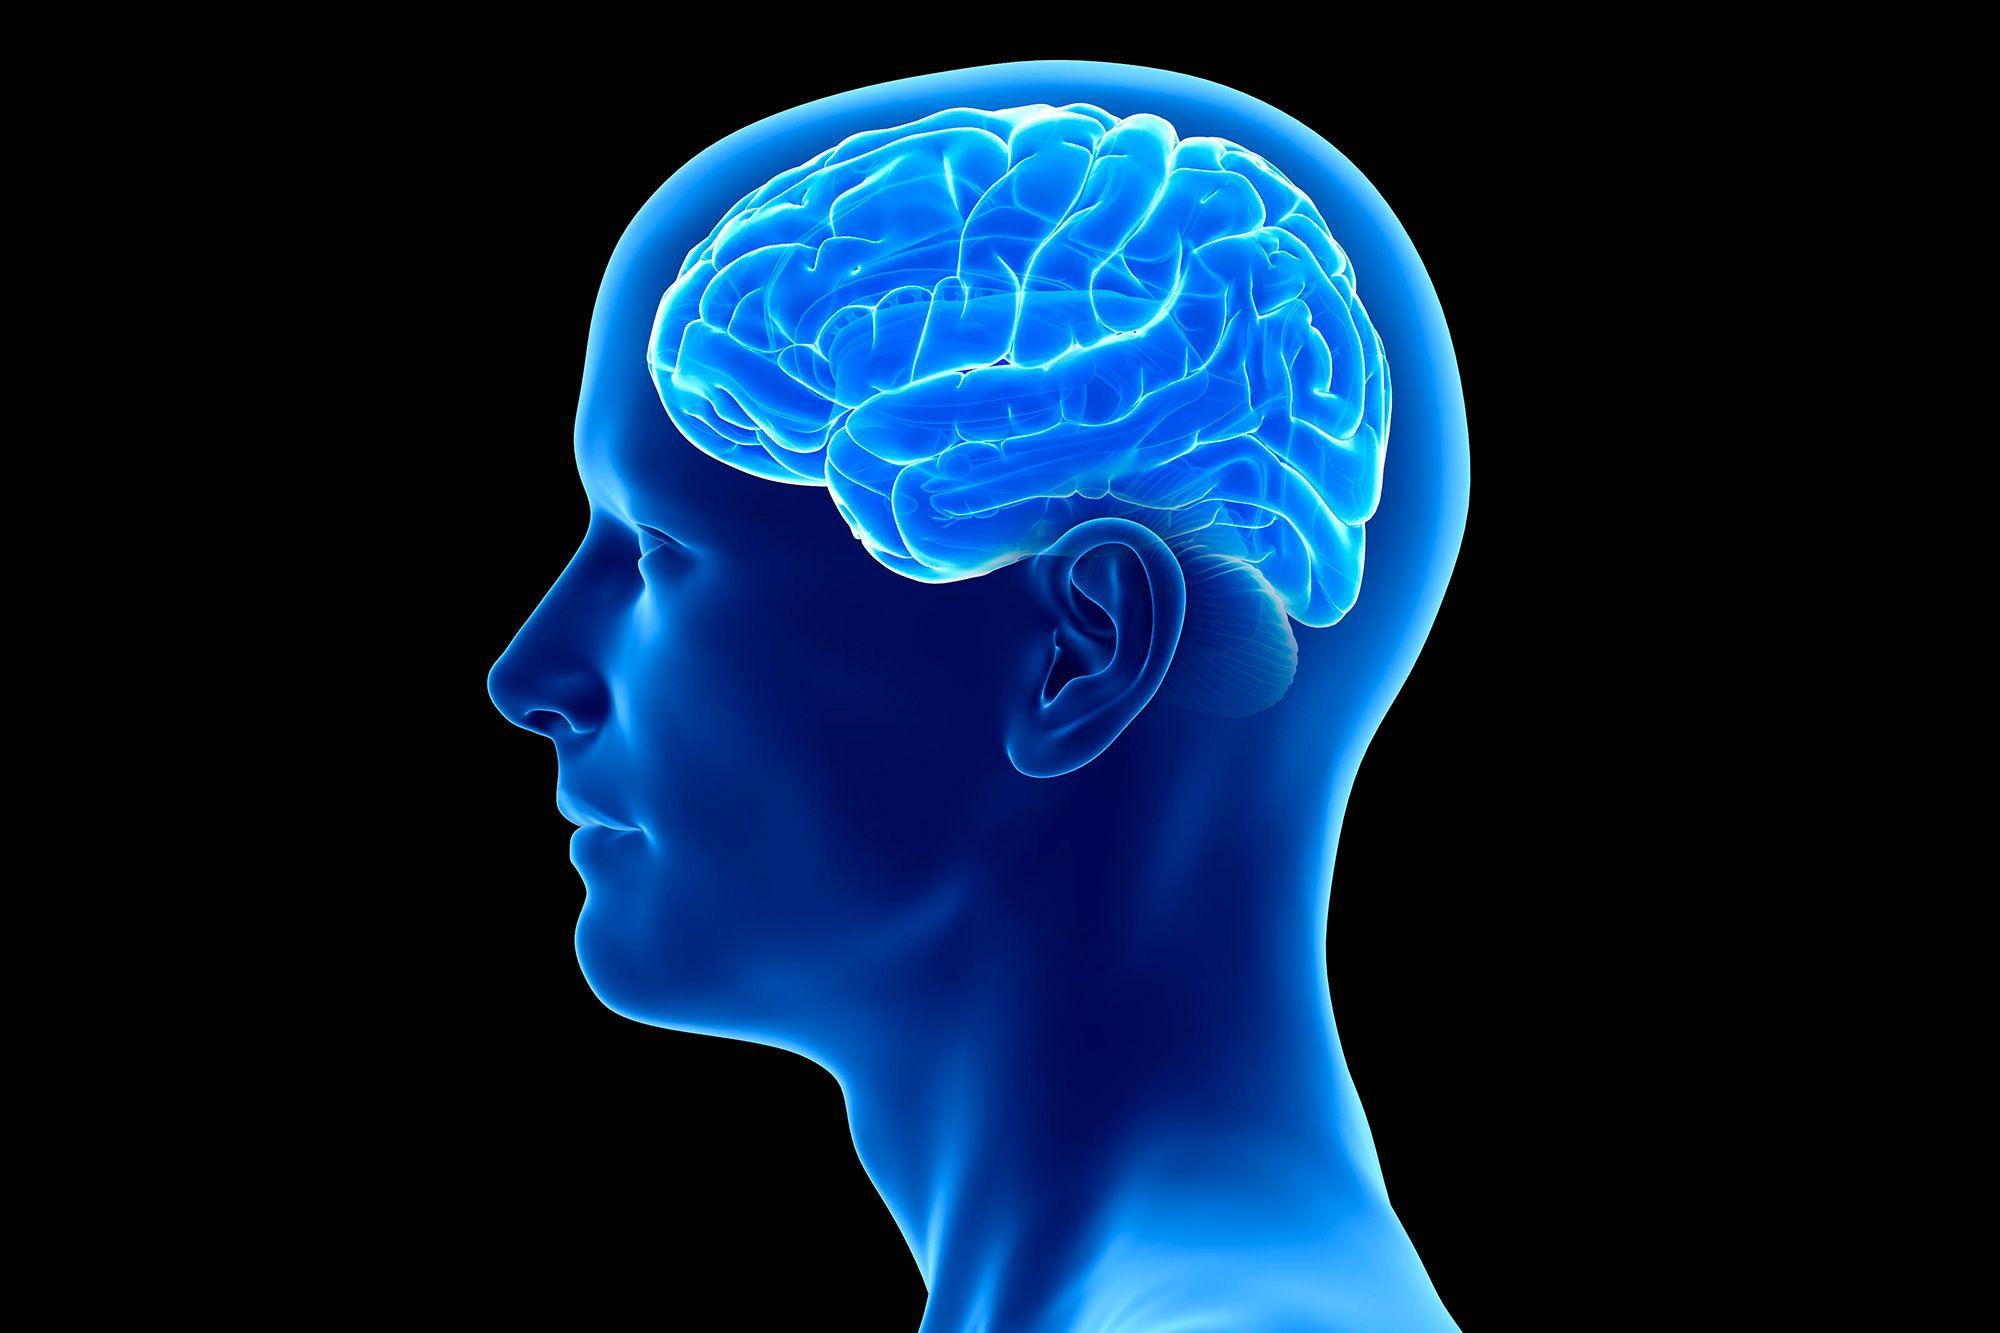 brain نتیجه پژوهشی جدید: ویروس کرونا از طریق بینی به مغز حمله میکند اخبار IT